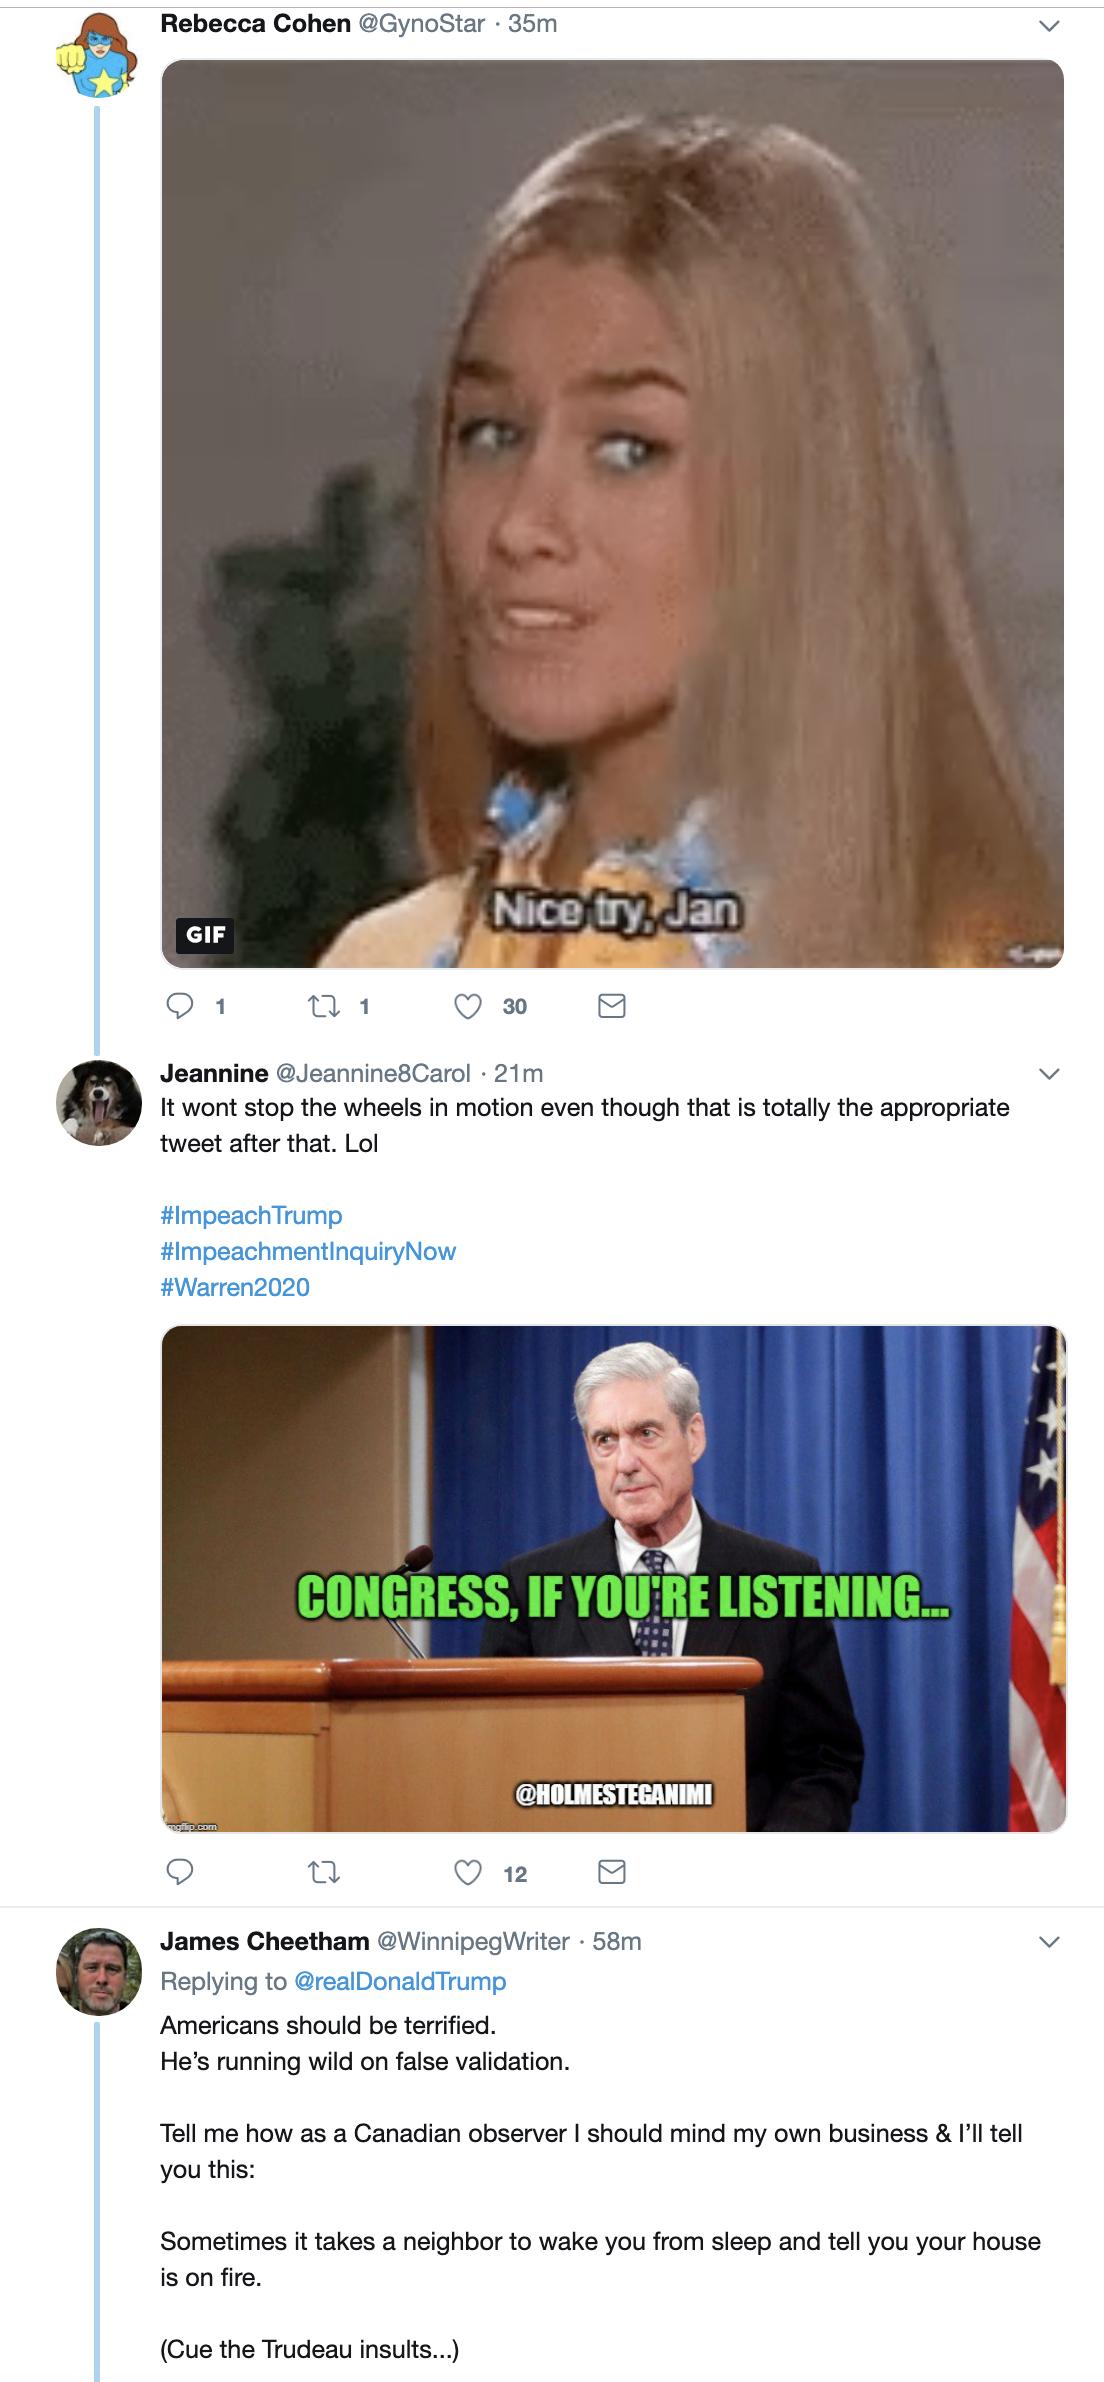 Screen-Shot-2019-05-30-at-8.37.16-AM Trump Denies AM Mueller Rant Moments After He Tweeted It (VIDEO) Corruption Crime Donald Trump Election 2016 Impeachment Investigation Mueller Politics Robert Mueller Russia Top Stories